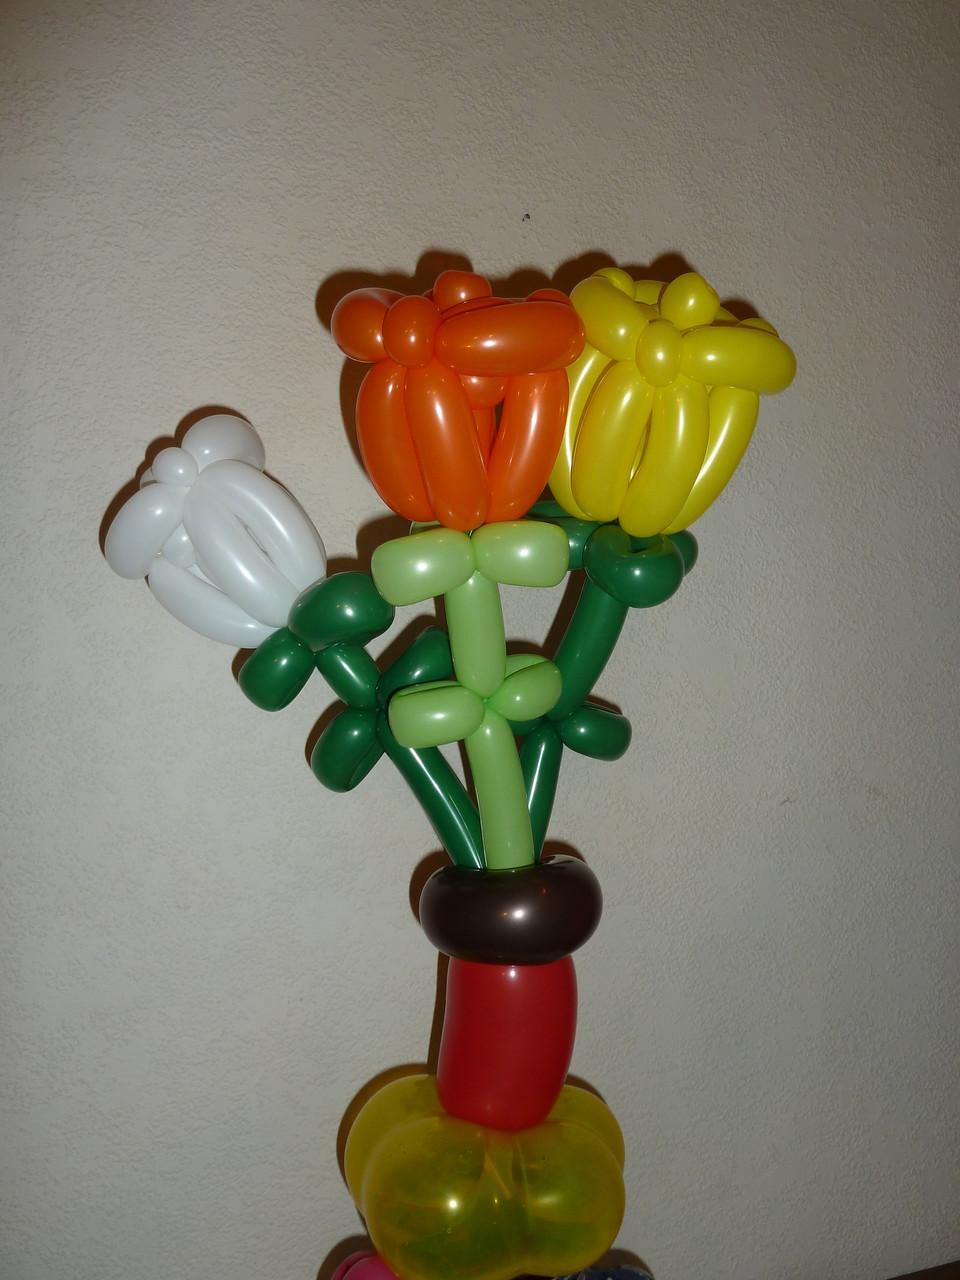 Ballonblumen twisten,  Blumenstrauß,  Mr. toni balloni ch